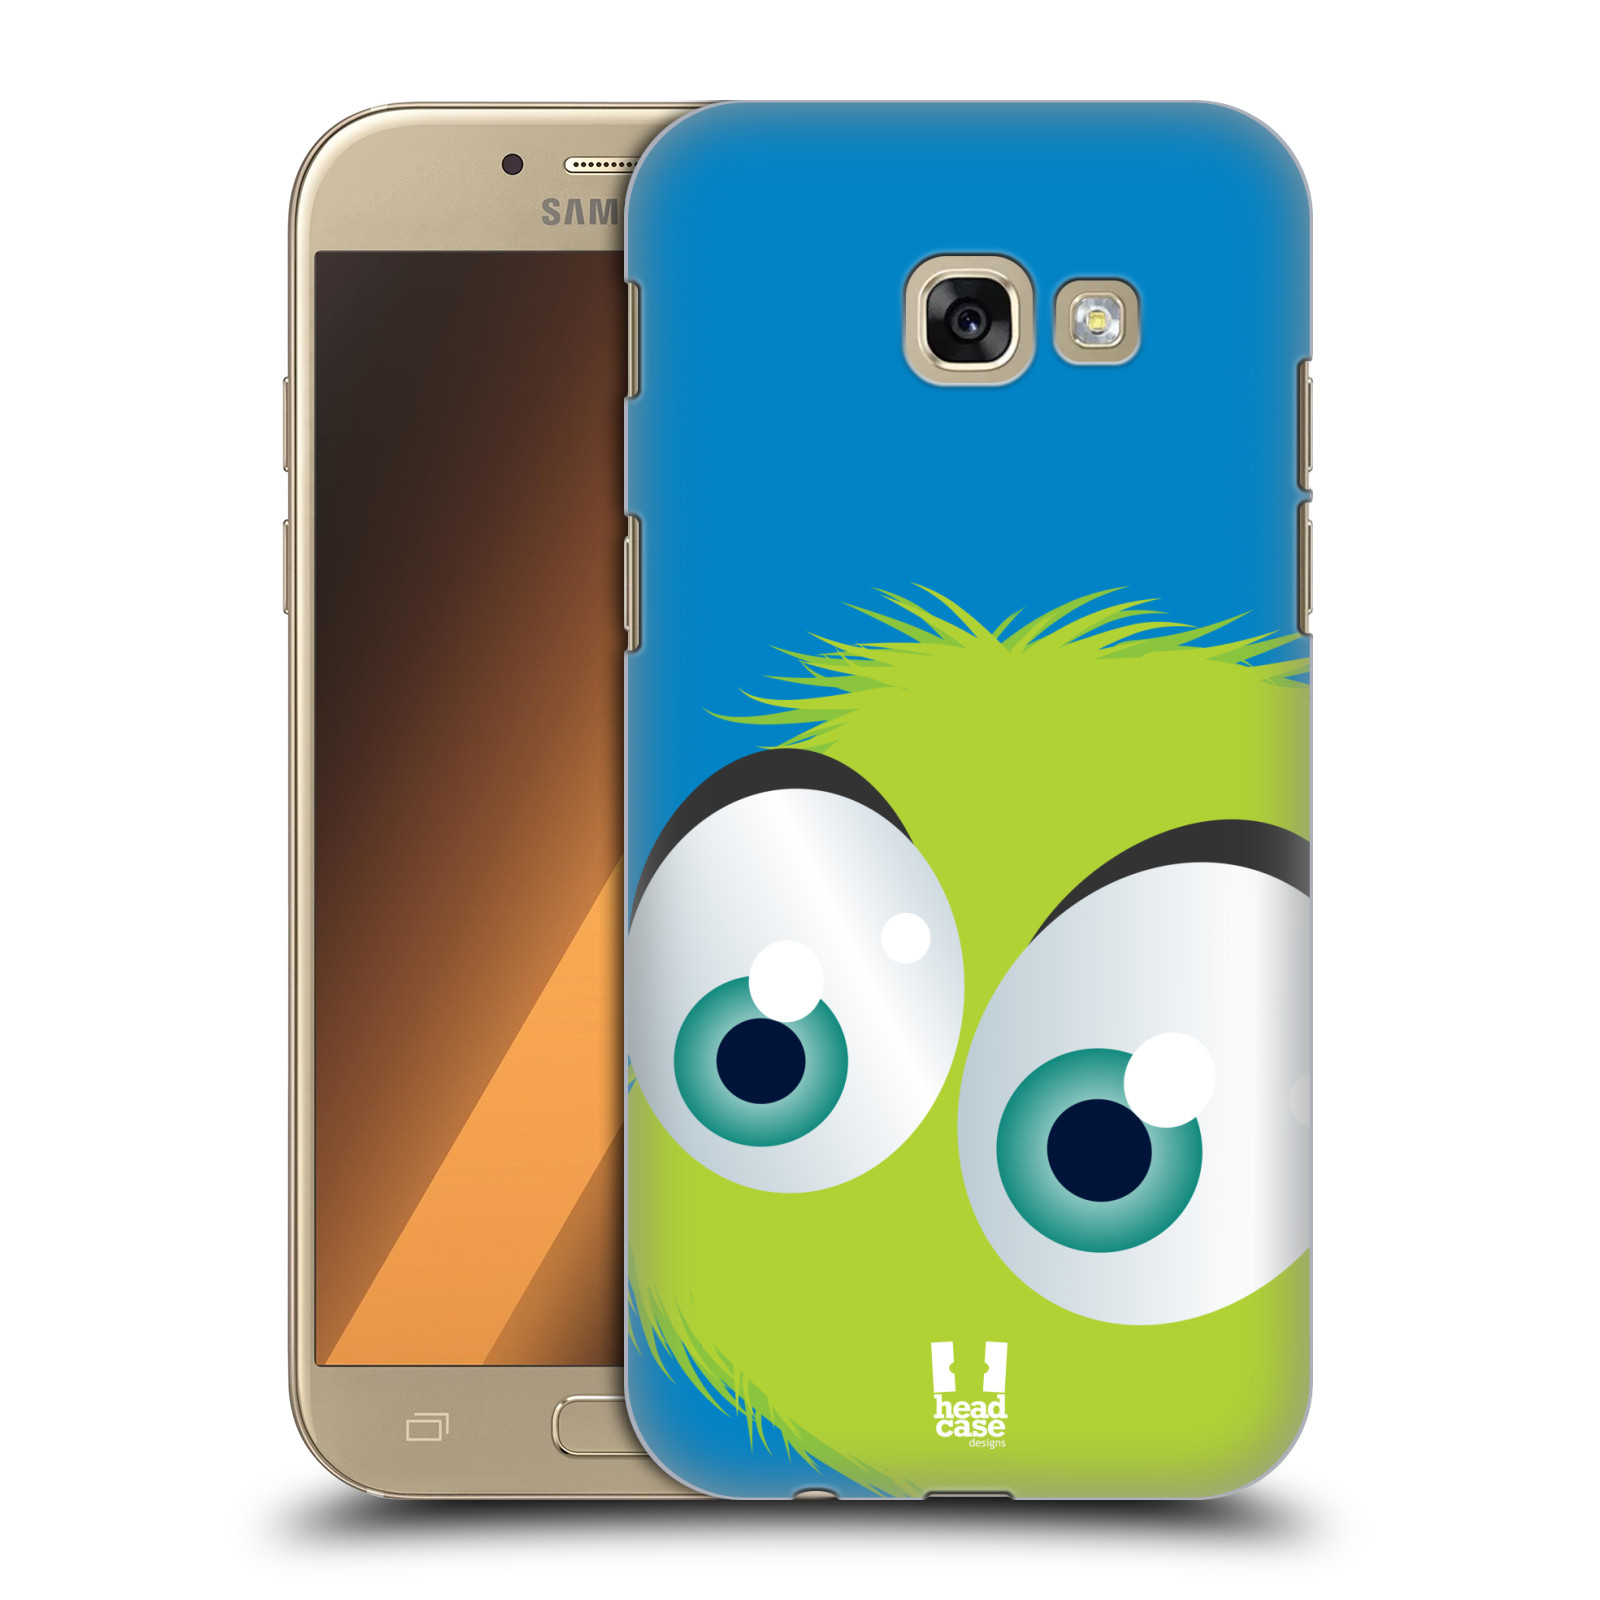 Plastové pouzdro na mobil Samsung Galaxy A5 (2017) HEAD CASE FUZÍK ZELENÝ (Plastový kryt či obal na mobilní telefon Samsung Galaxy A5 2017 SM-A520)